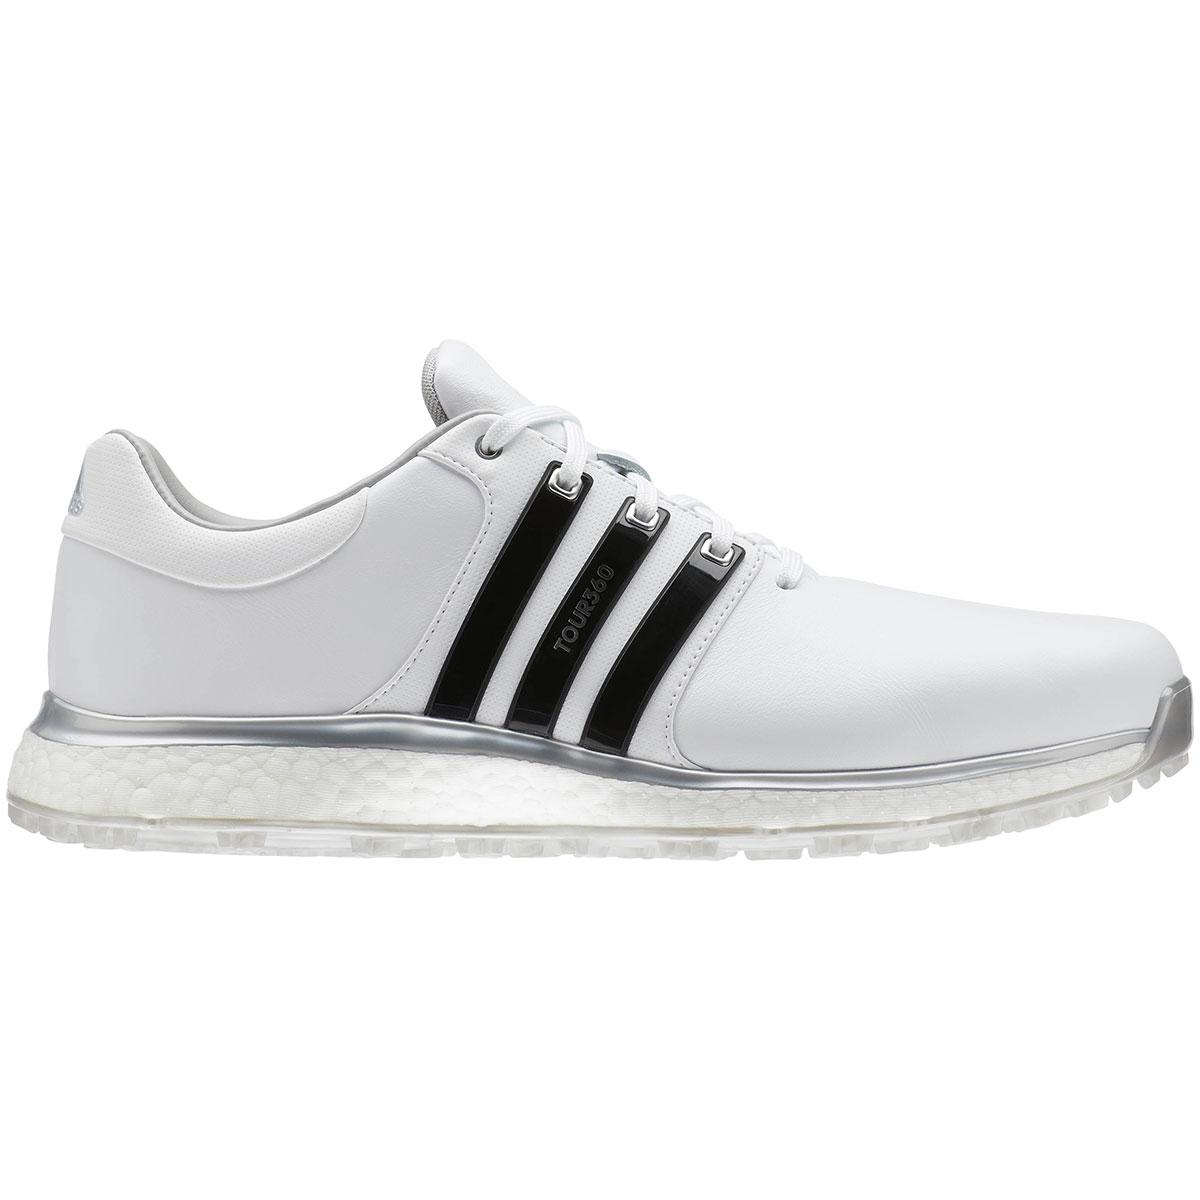 Adidas Tour360 XT Spikeless White/Black Golf Shoe